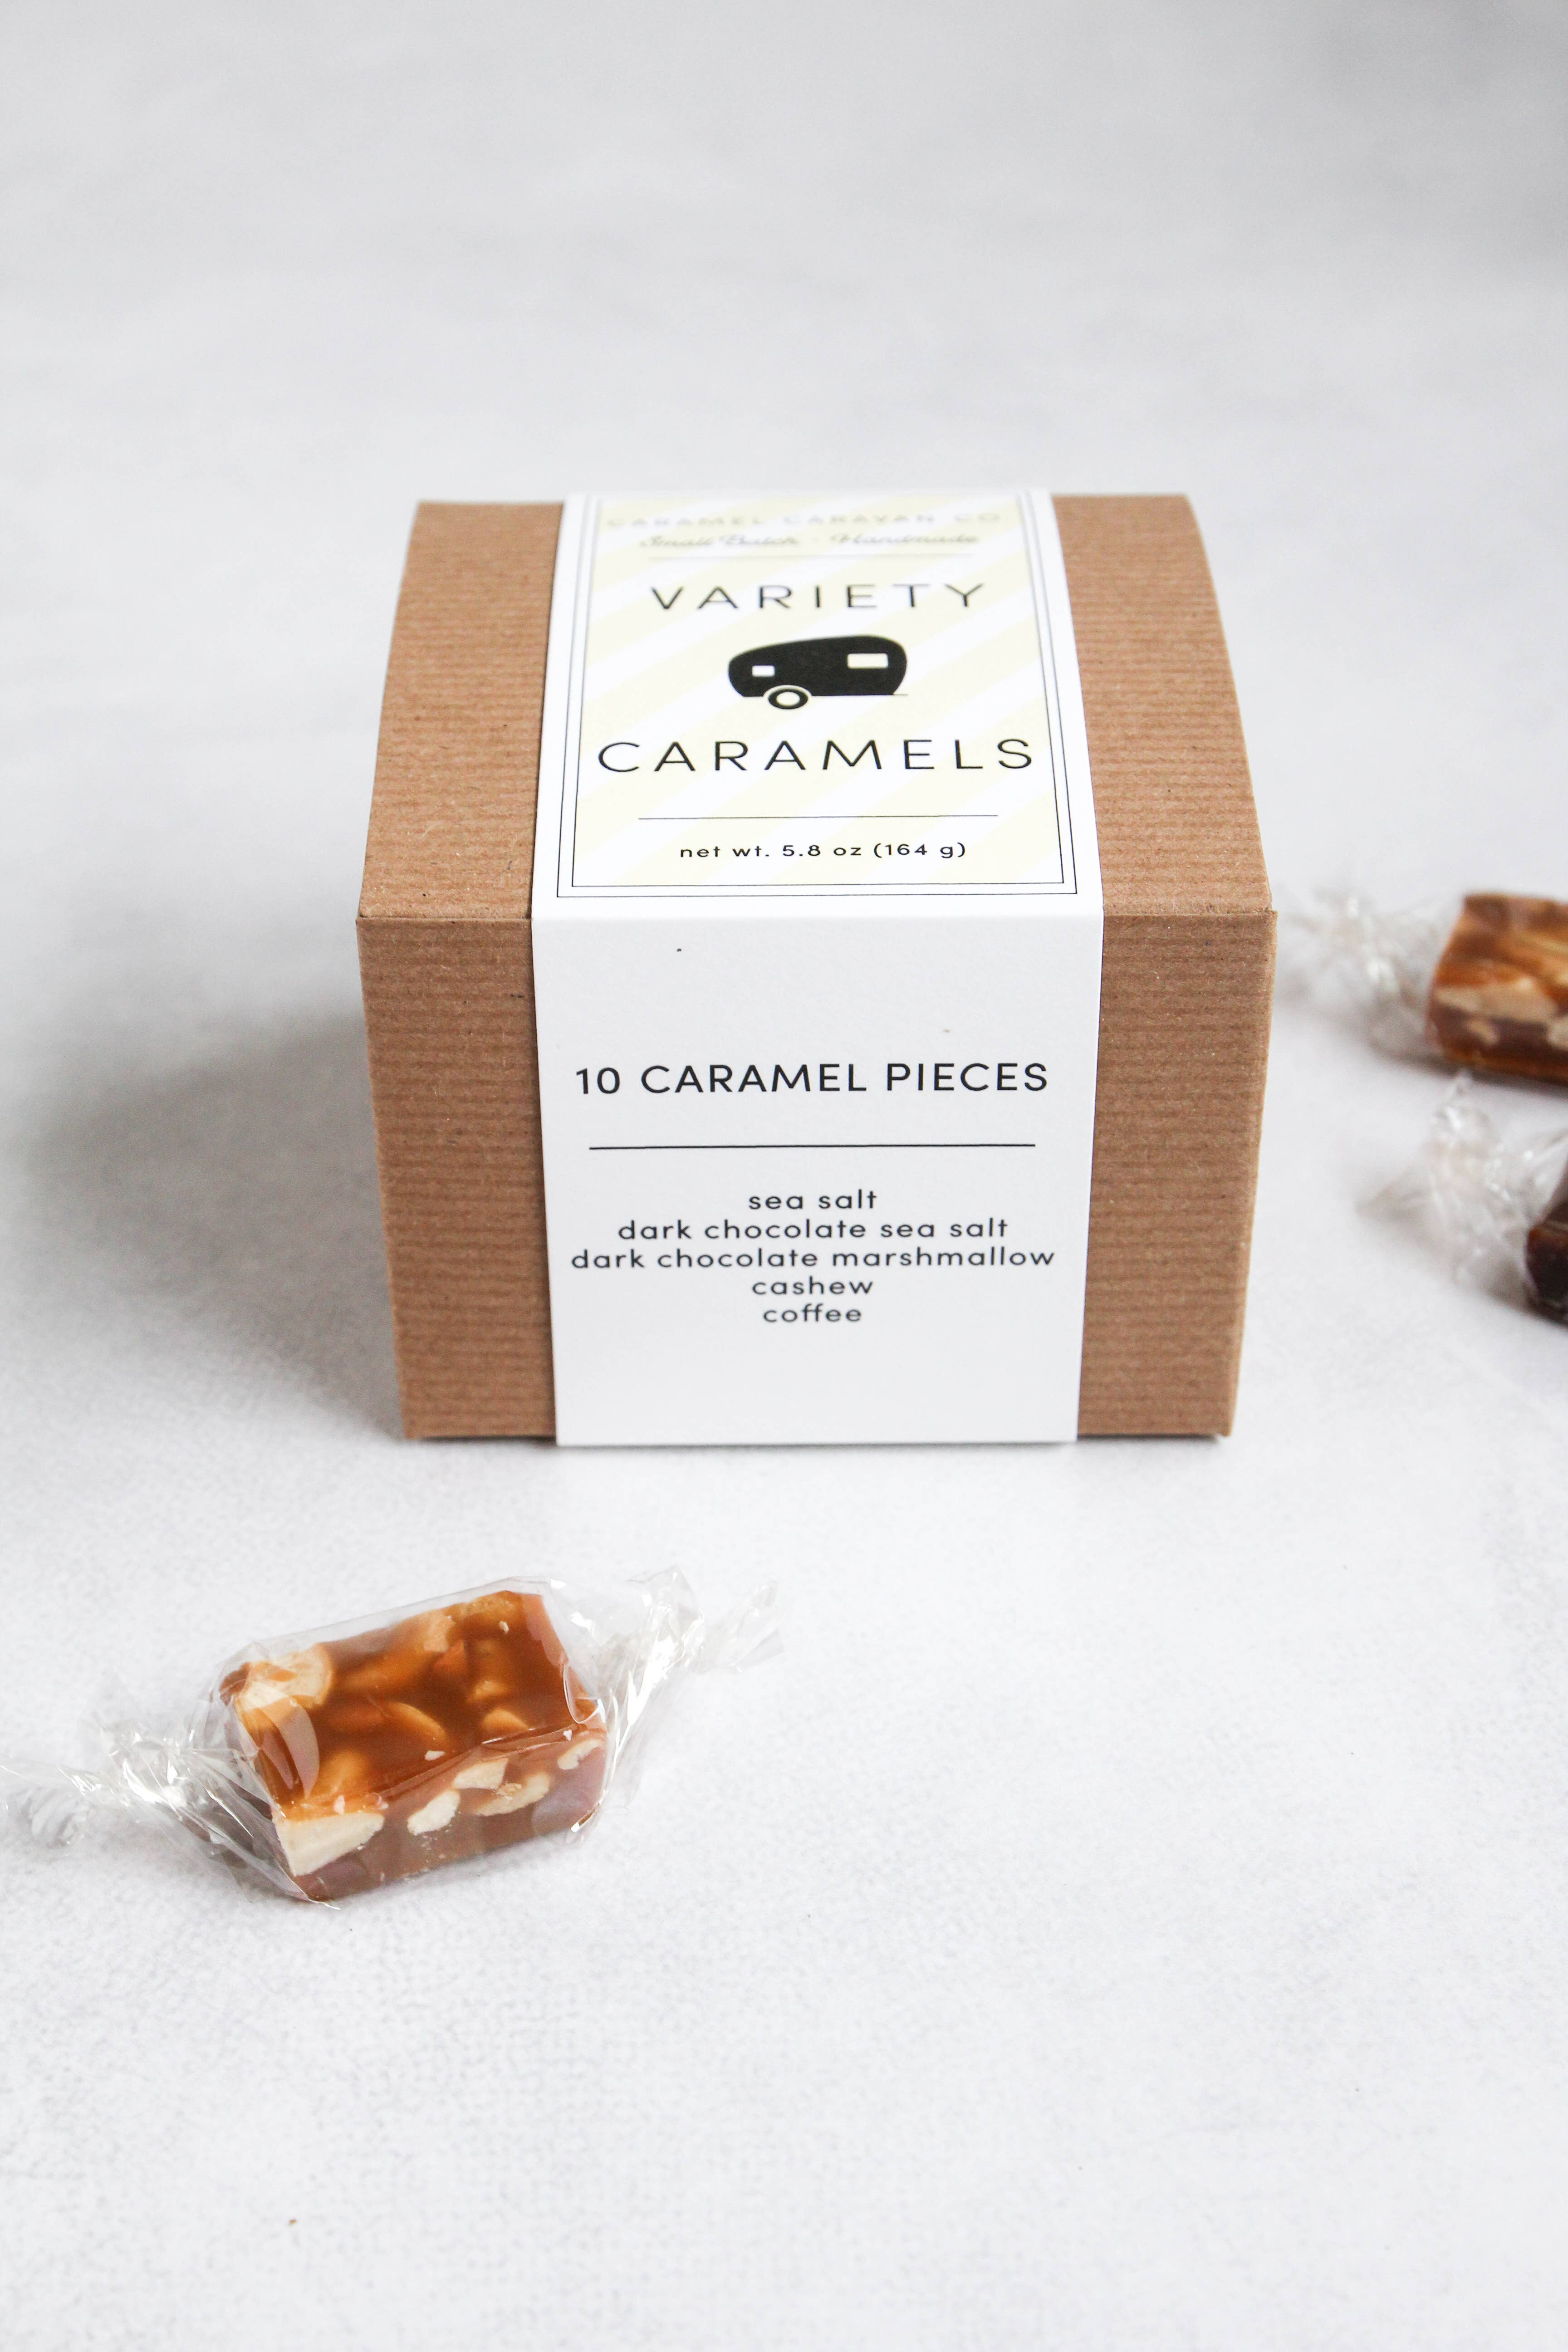 Variety Caramels - 10 Piece Box - Kraft | Trada Marketplace